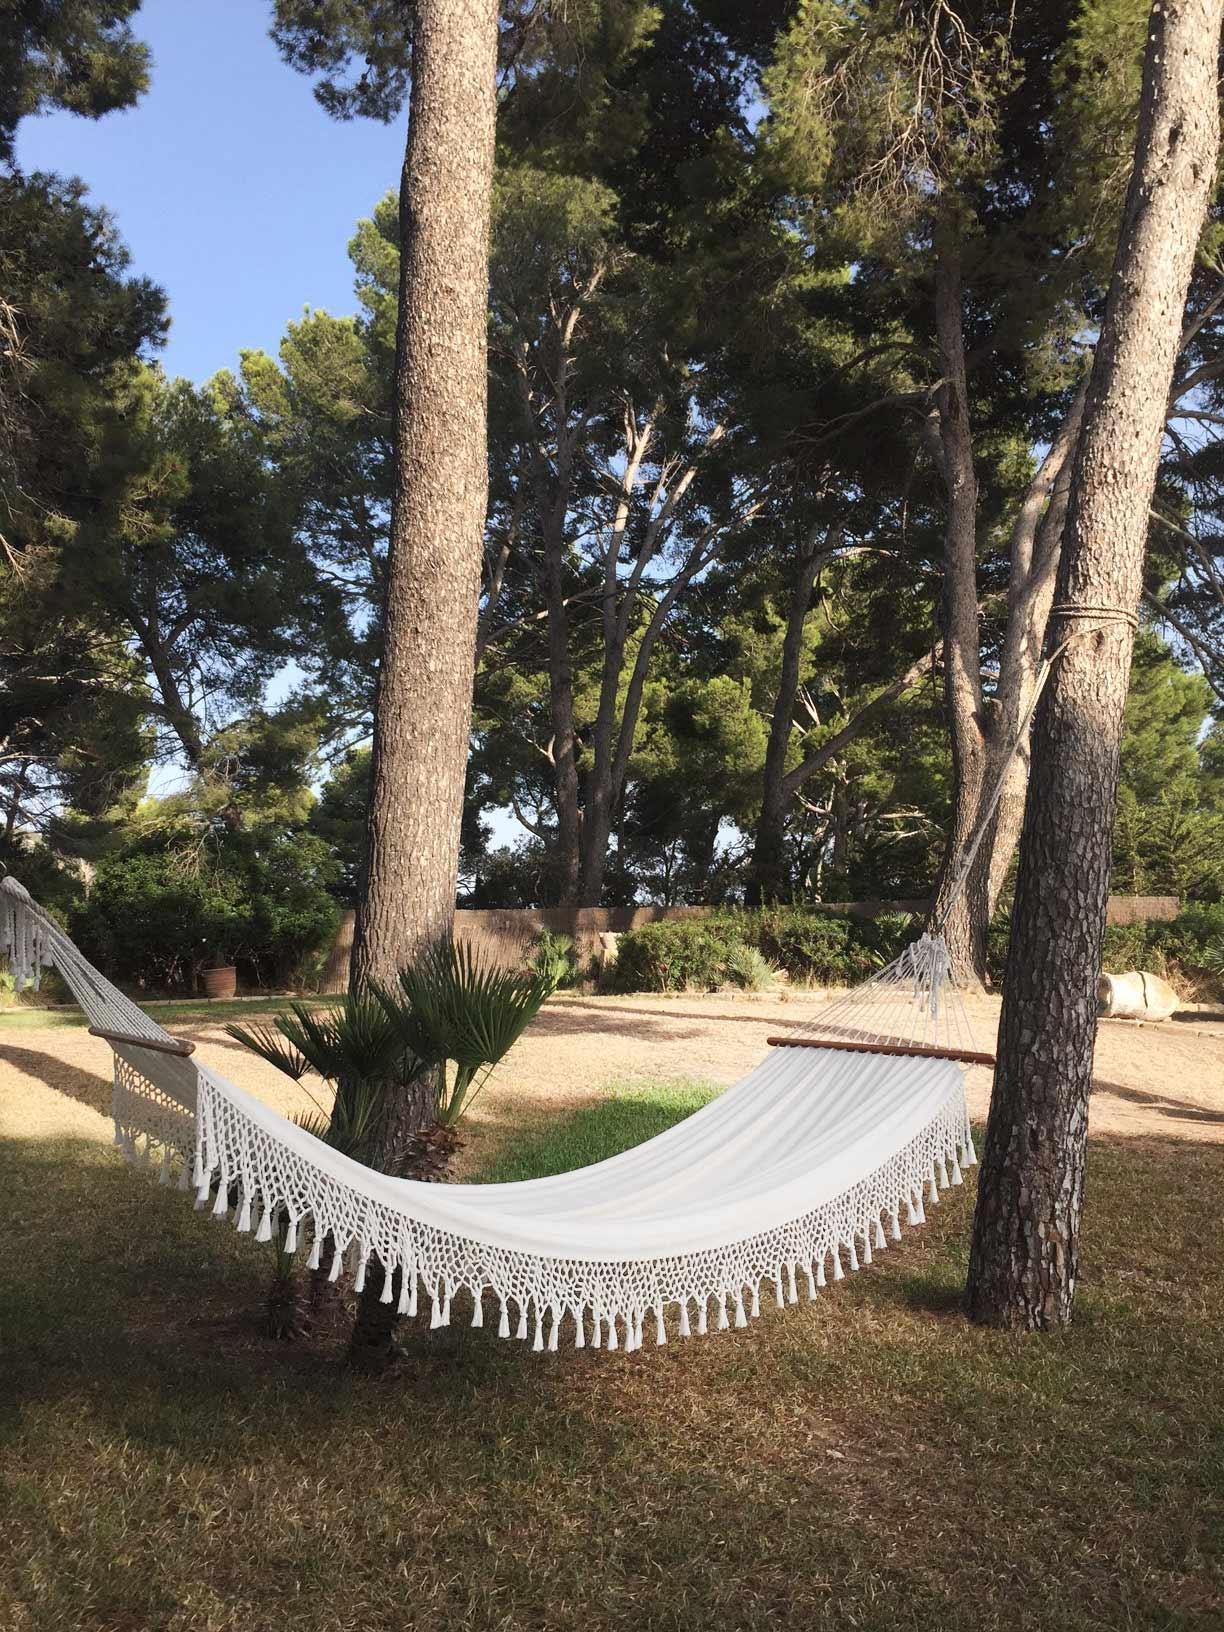 A white hammock hangs between trees in a garden